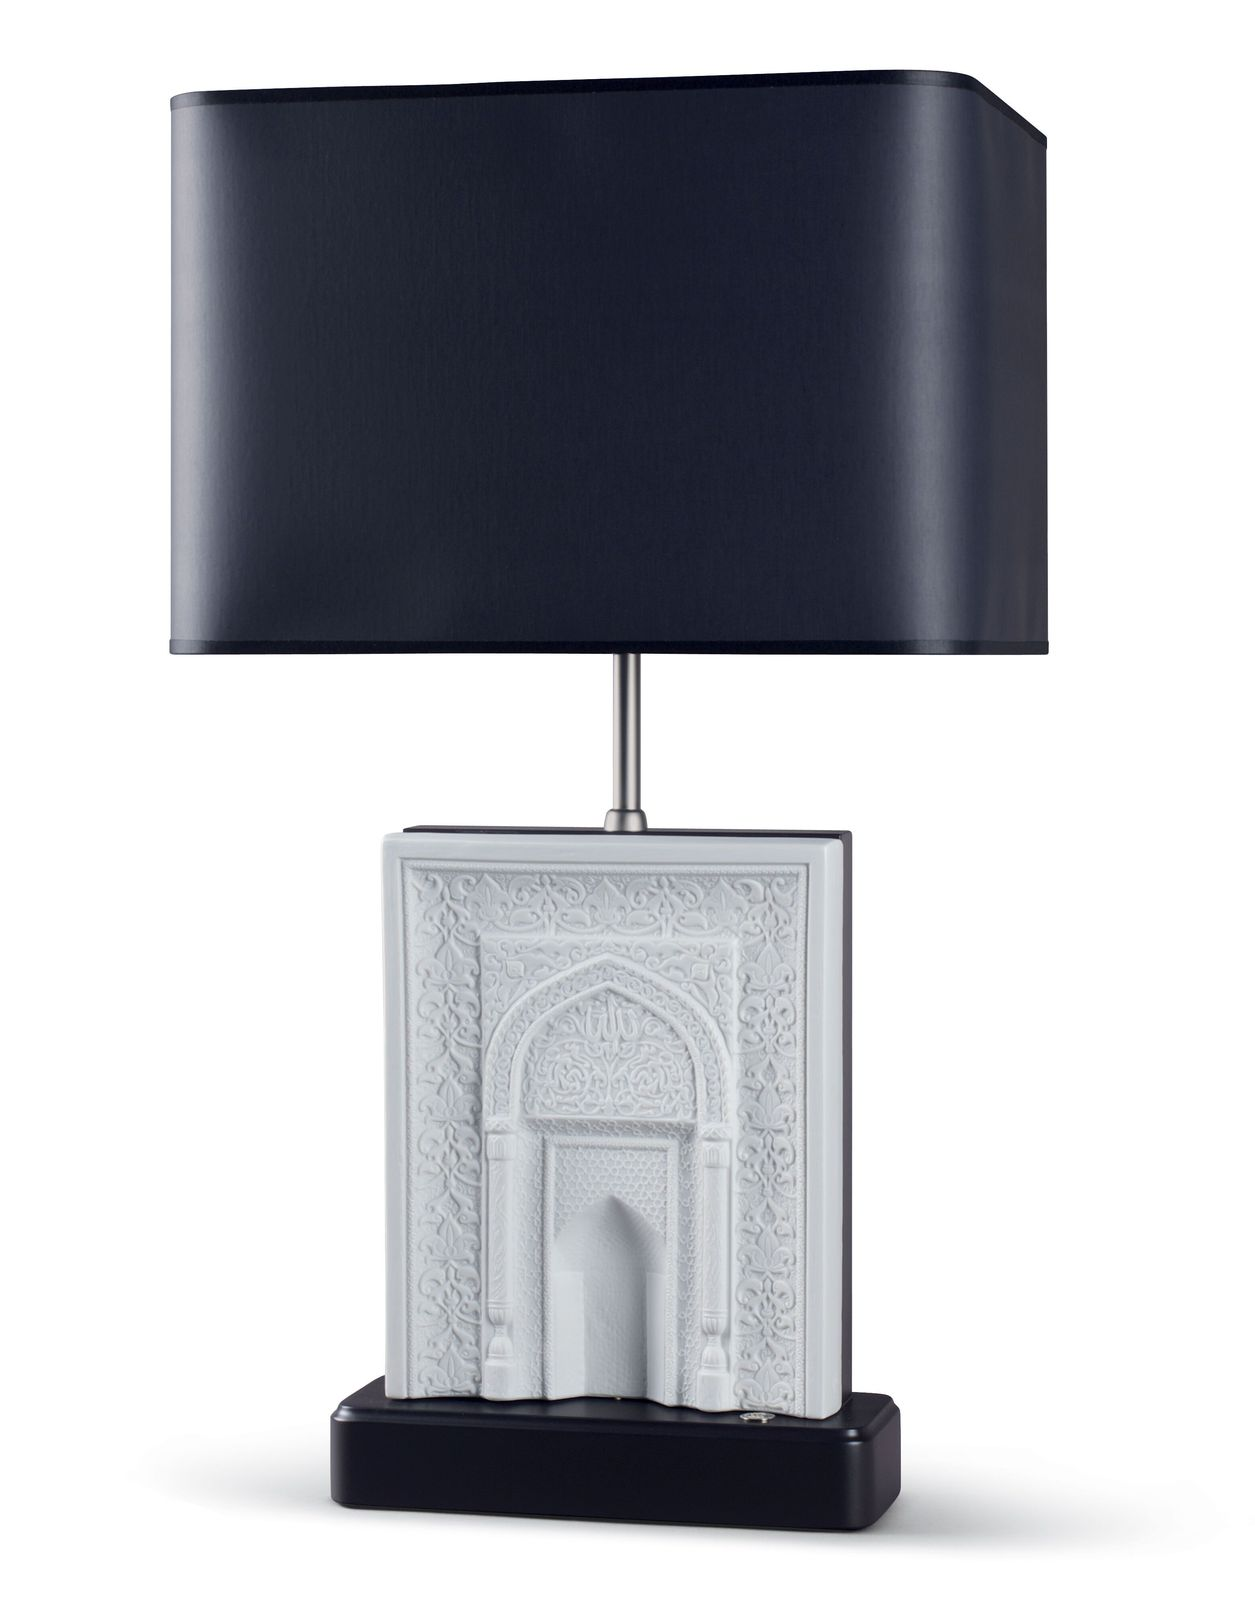 Lladro 01023110 Mihrab Lamp New  - $850.00